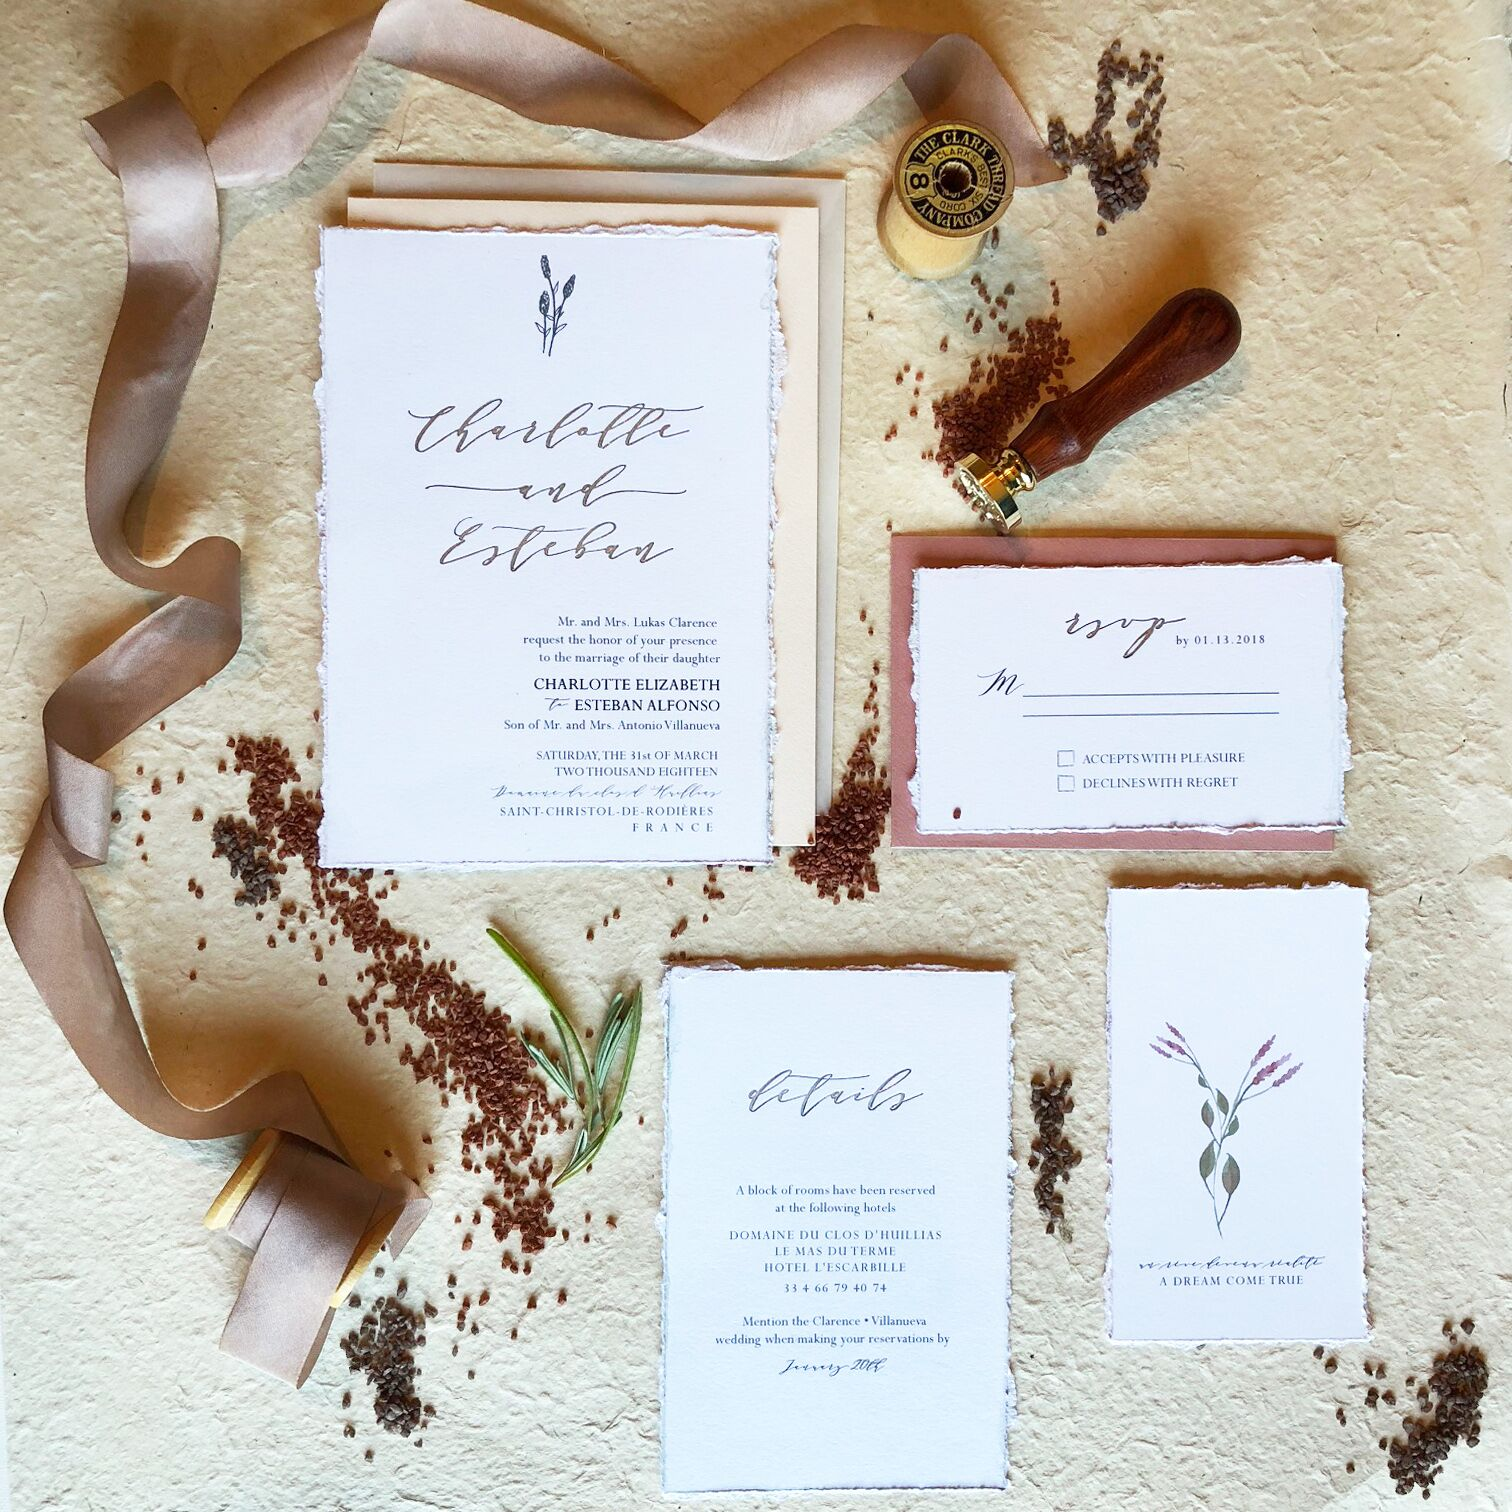 Invitations paper in philadelphia pa the knot elephant limbo monicamarmolfo Choice Image